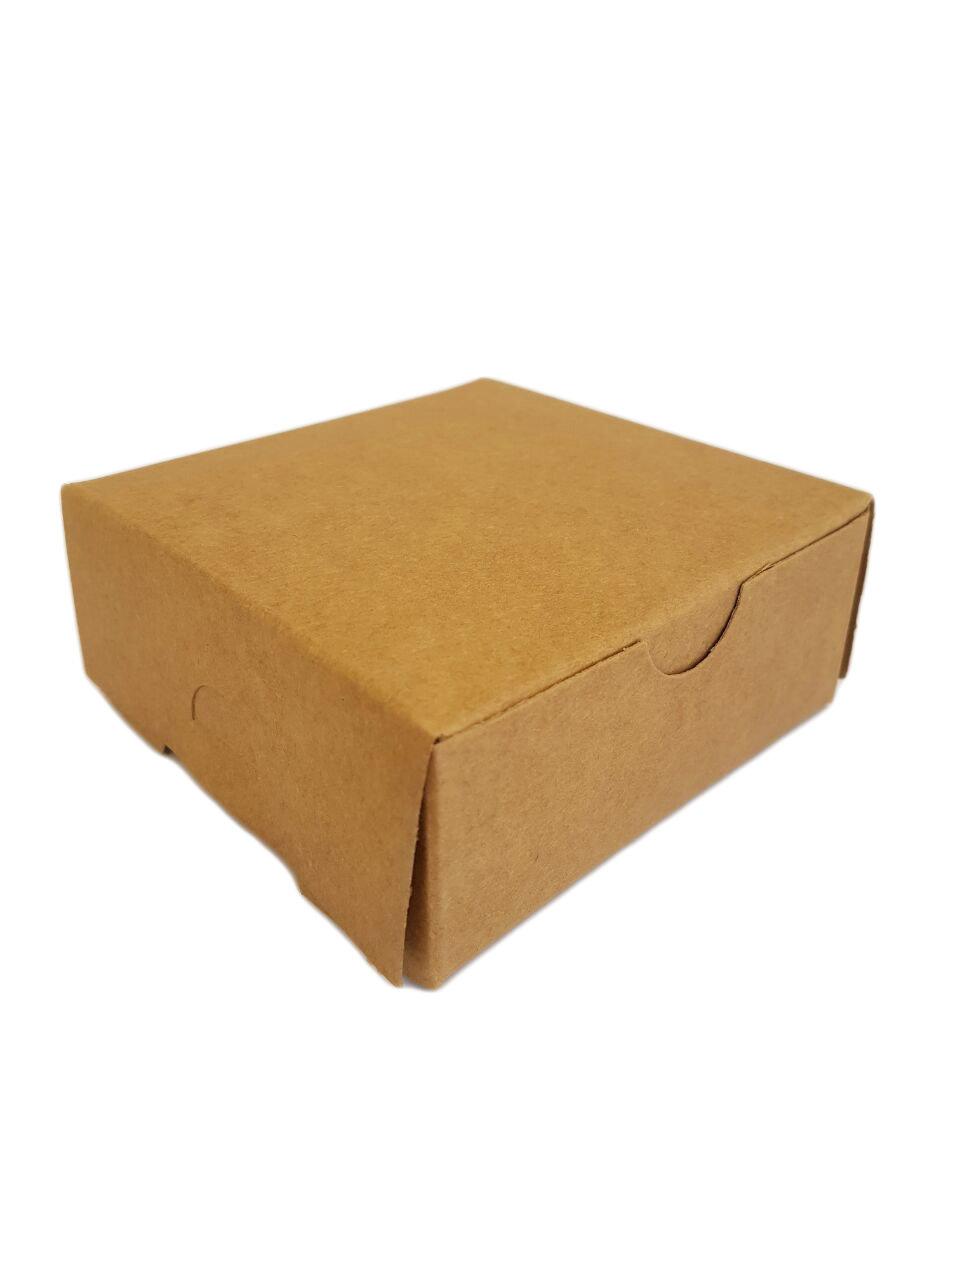 Cake Box Eco Brown 4 x 4 x 1.5